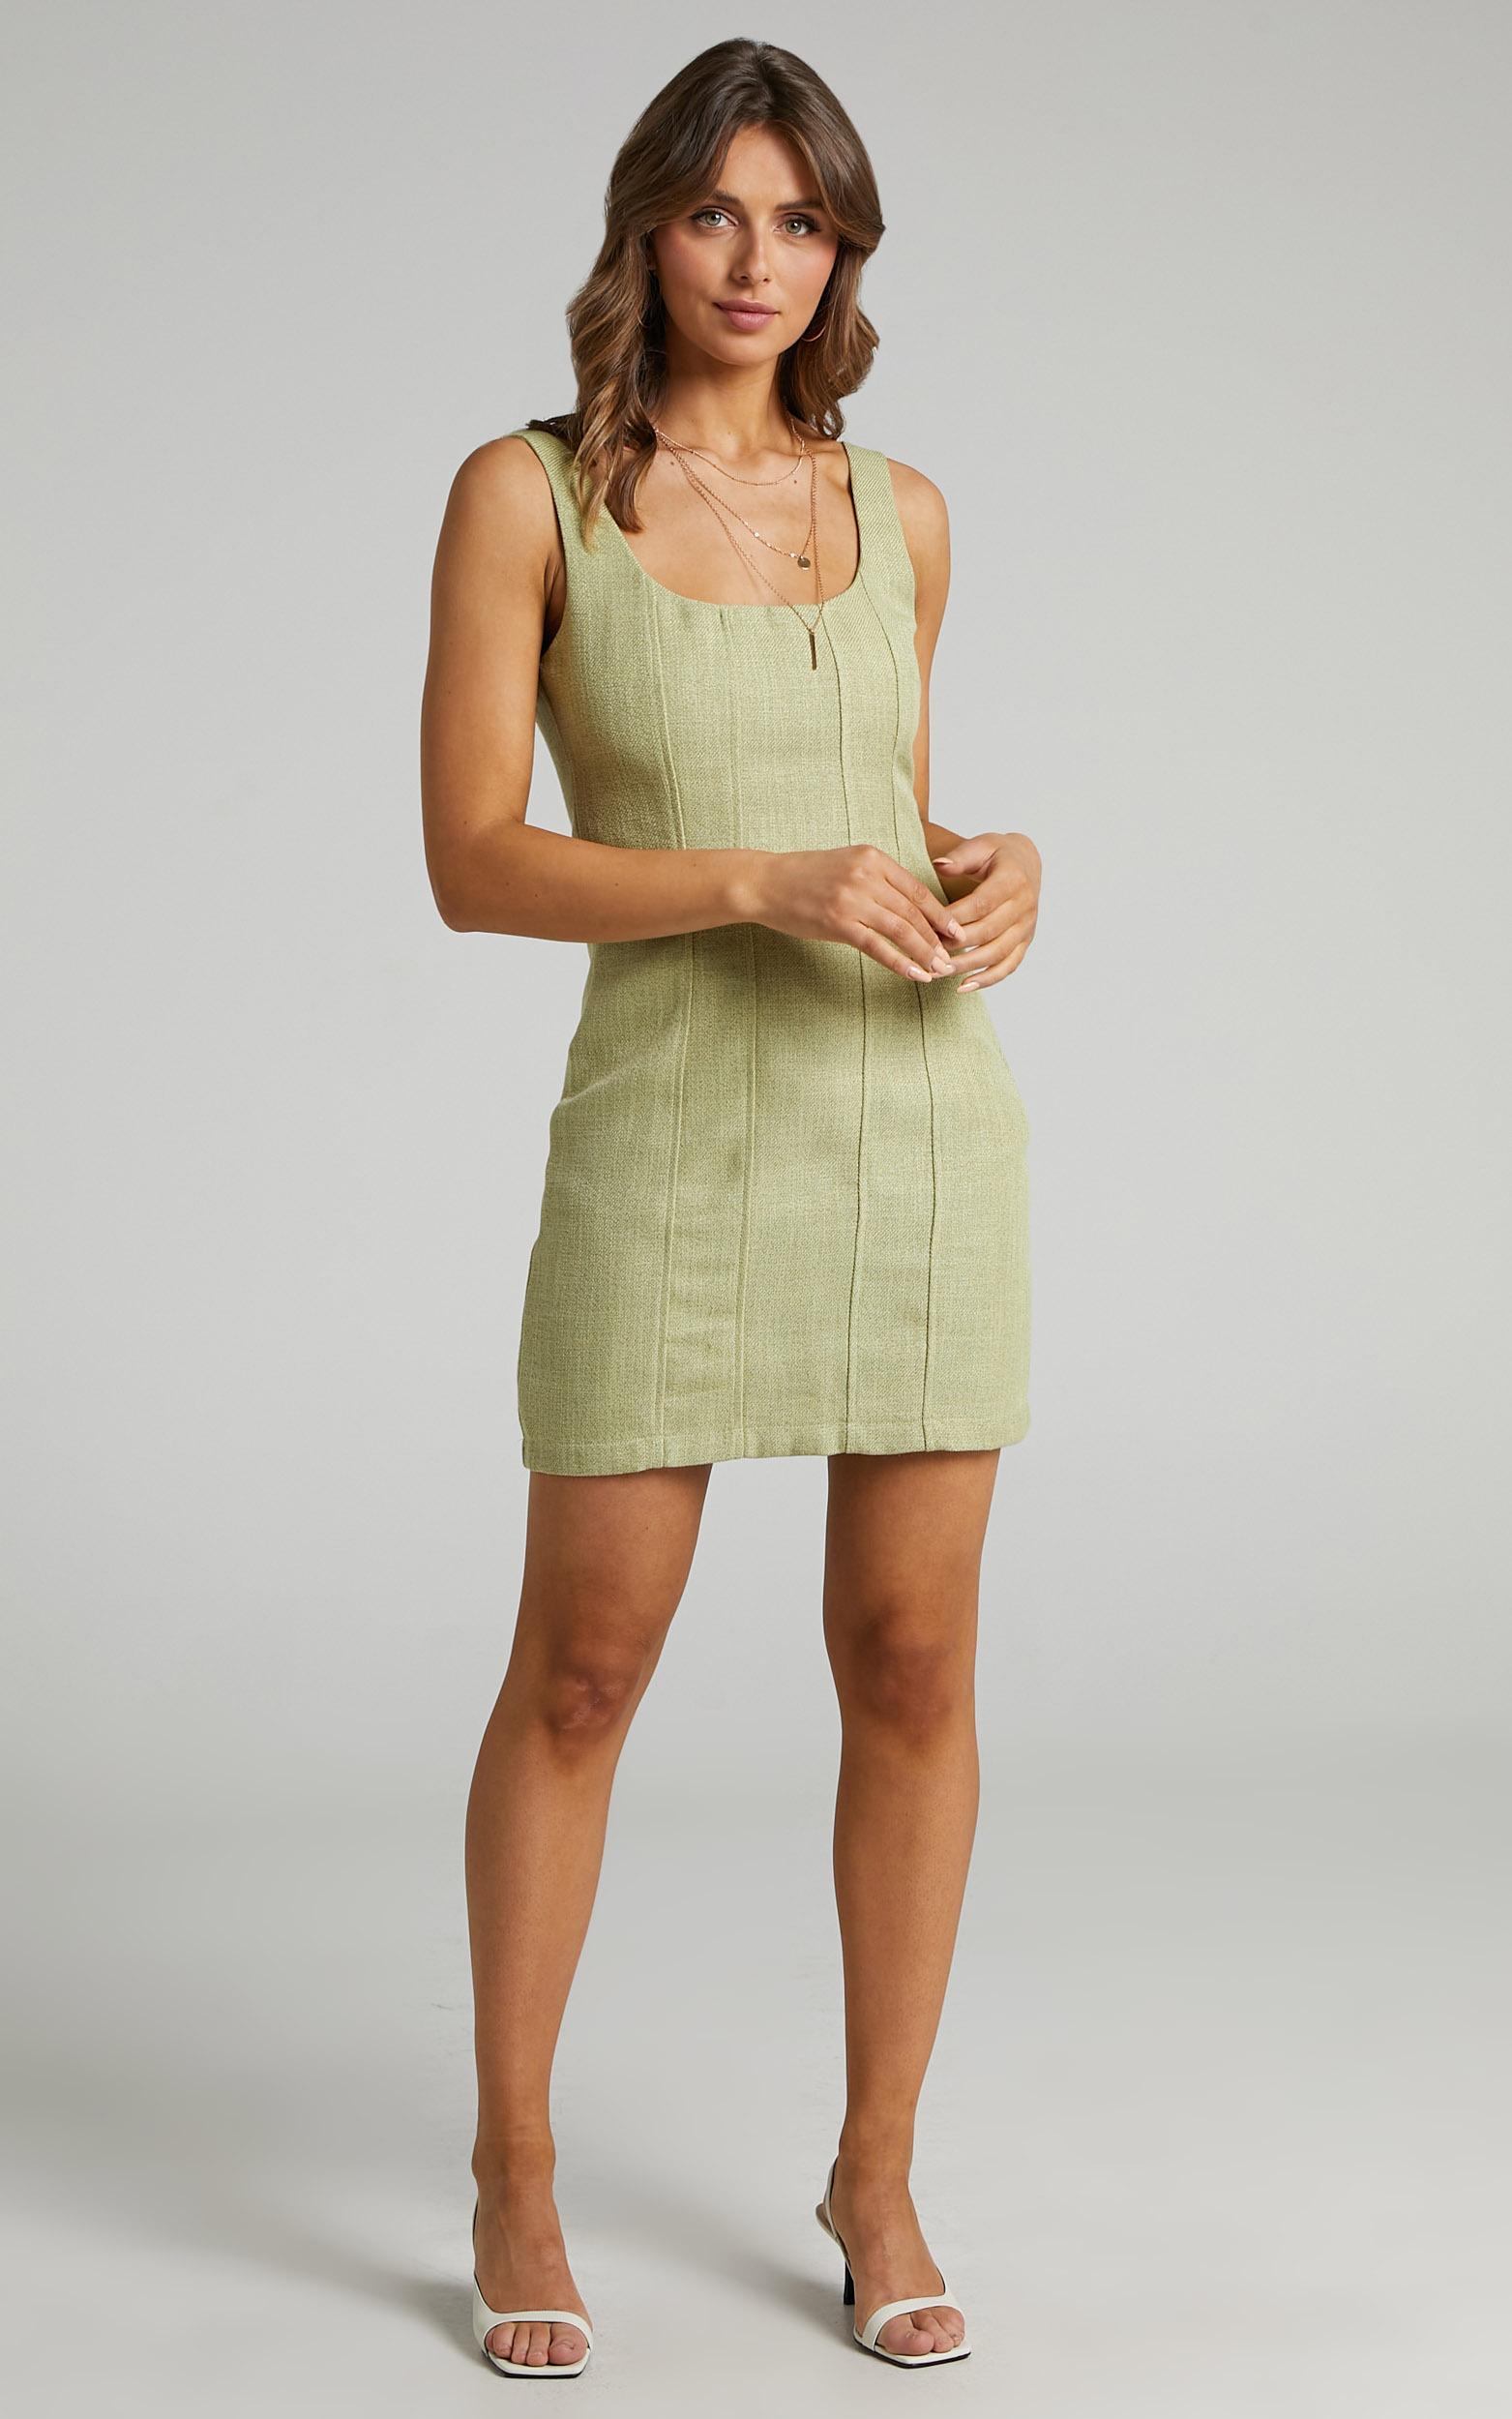 Nimby Mini Panelled Tweed Dress in Green Tweed - 04, GRN1, hi-res image number null